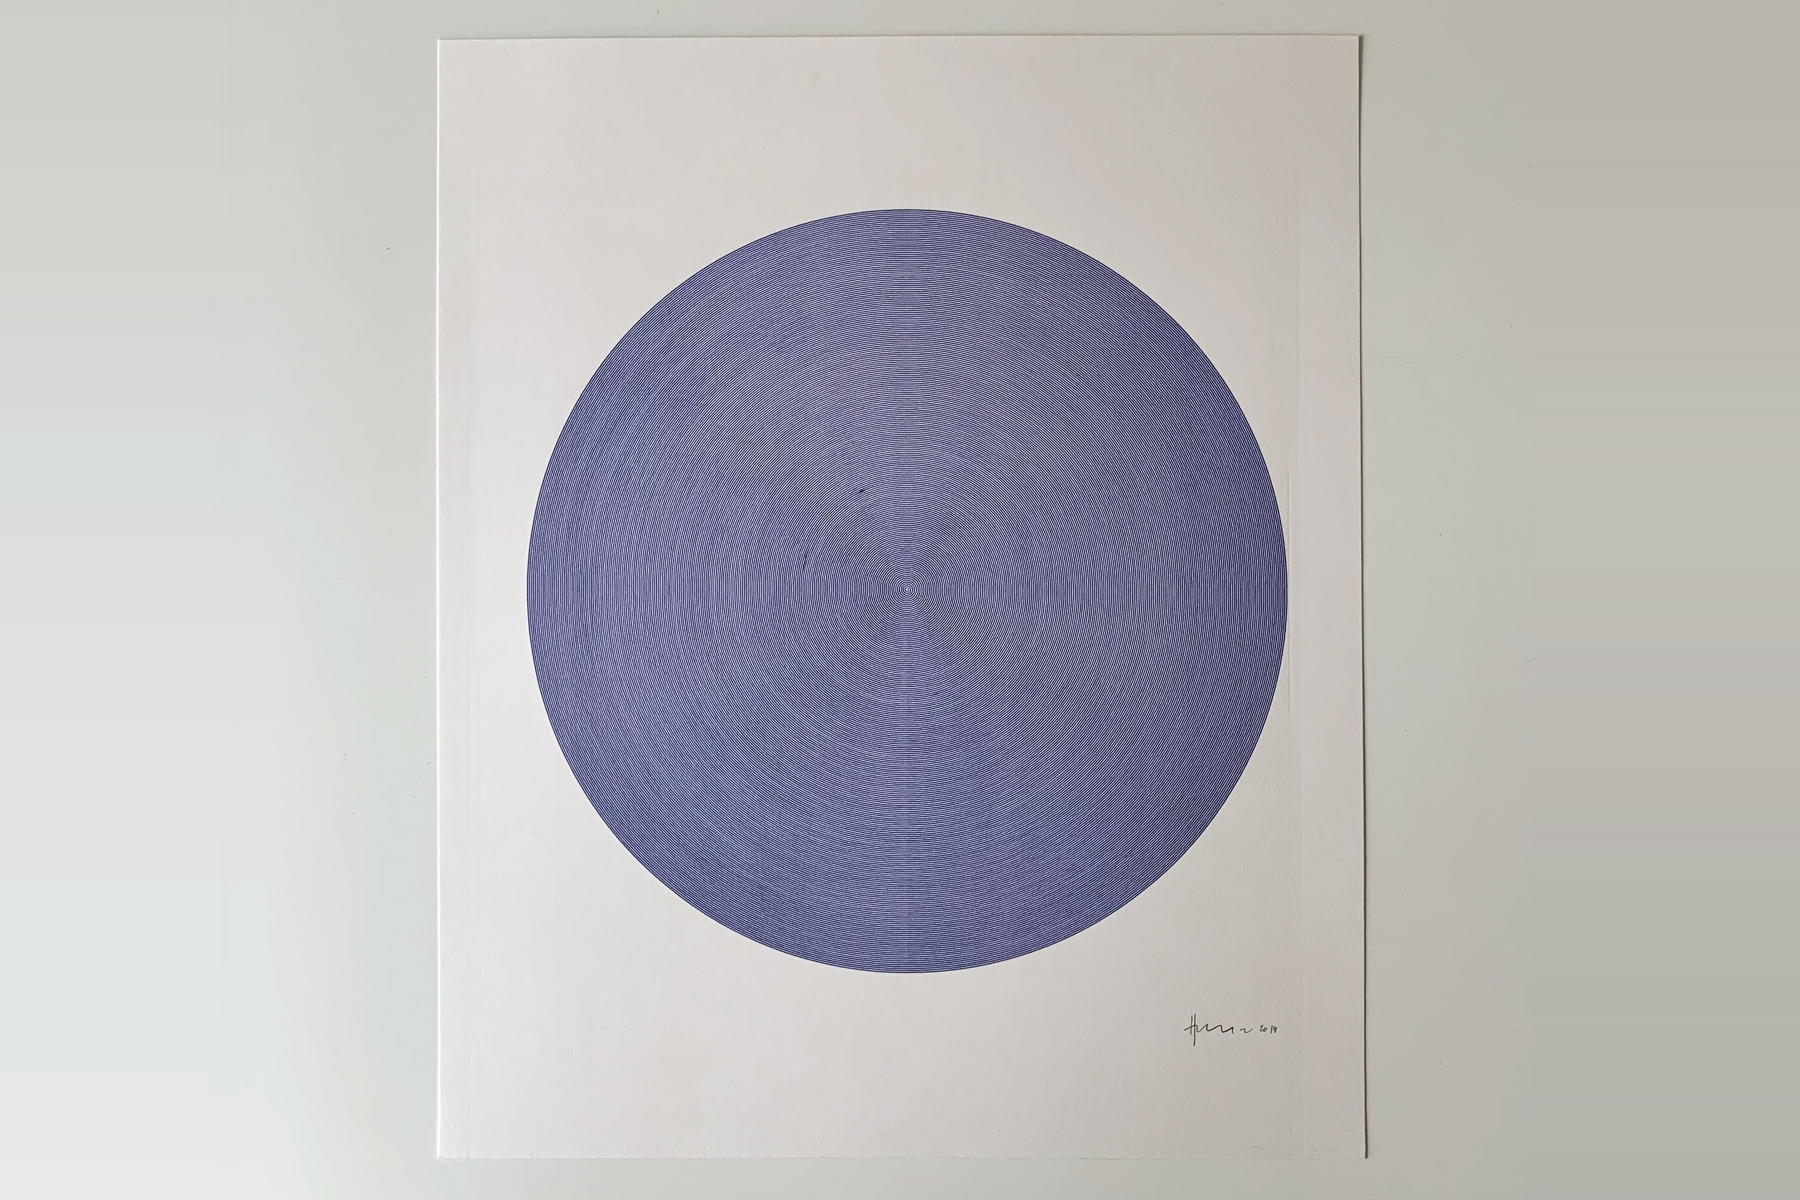 circle_01_03